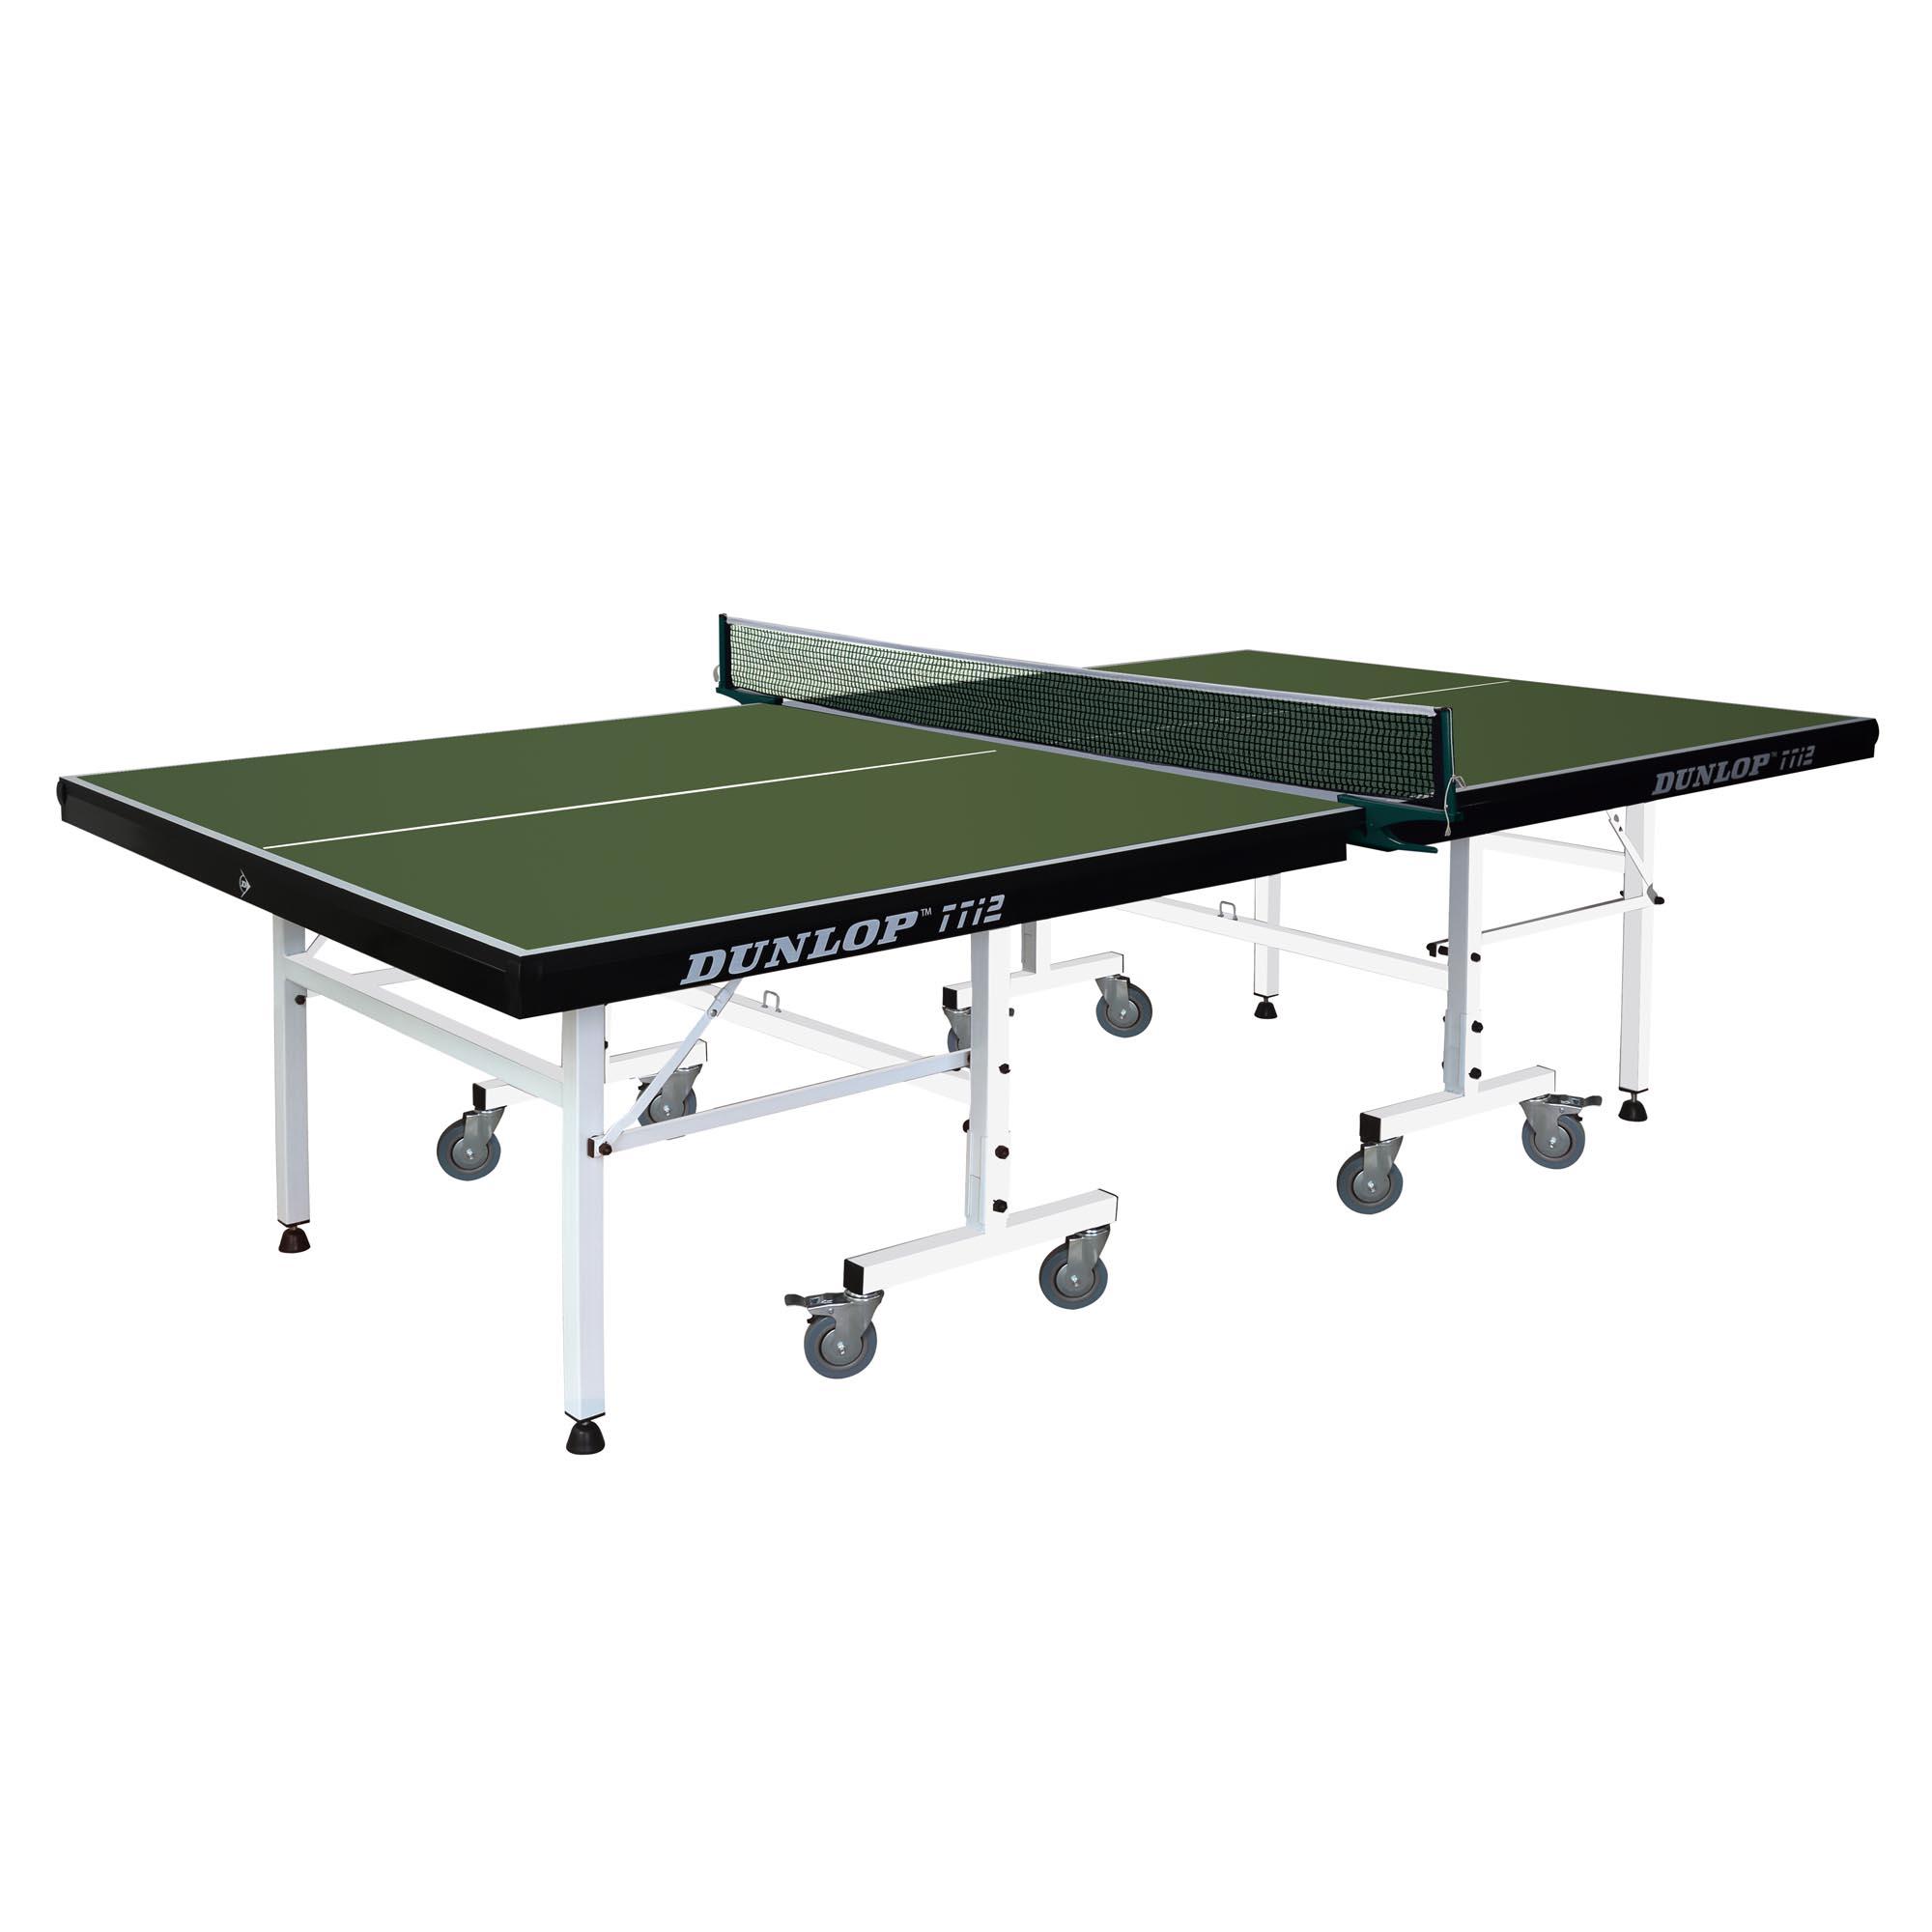 Dunlop TTi2 Indoor Table Tennis Table  Green